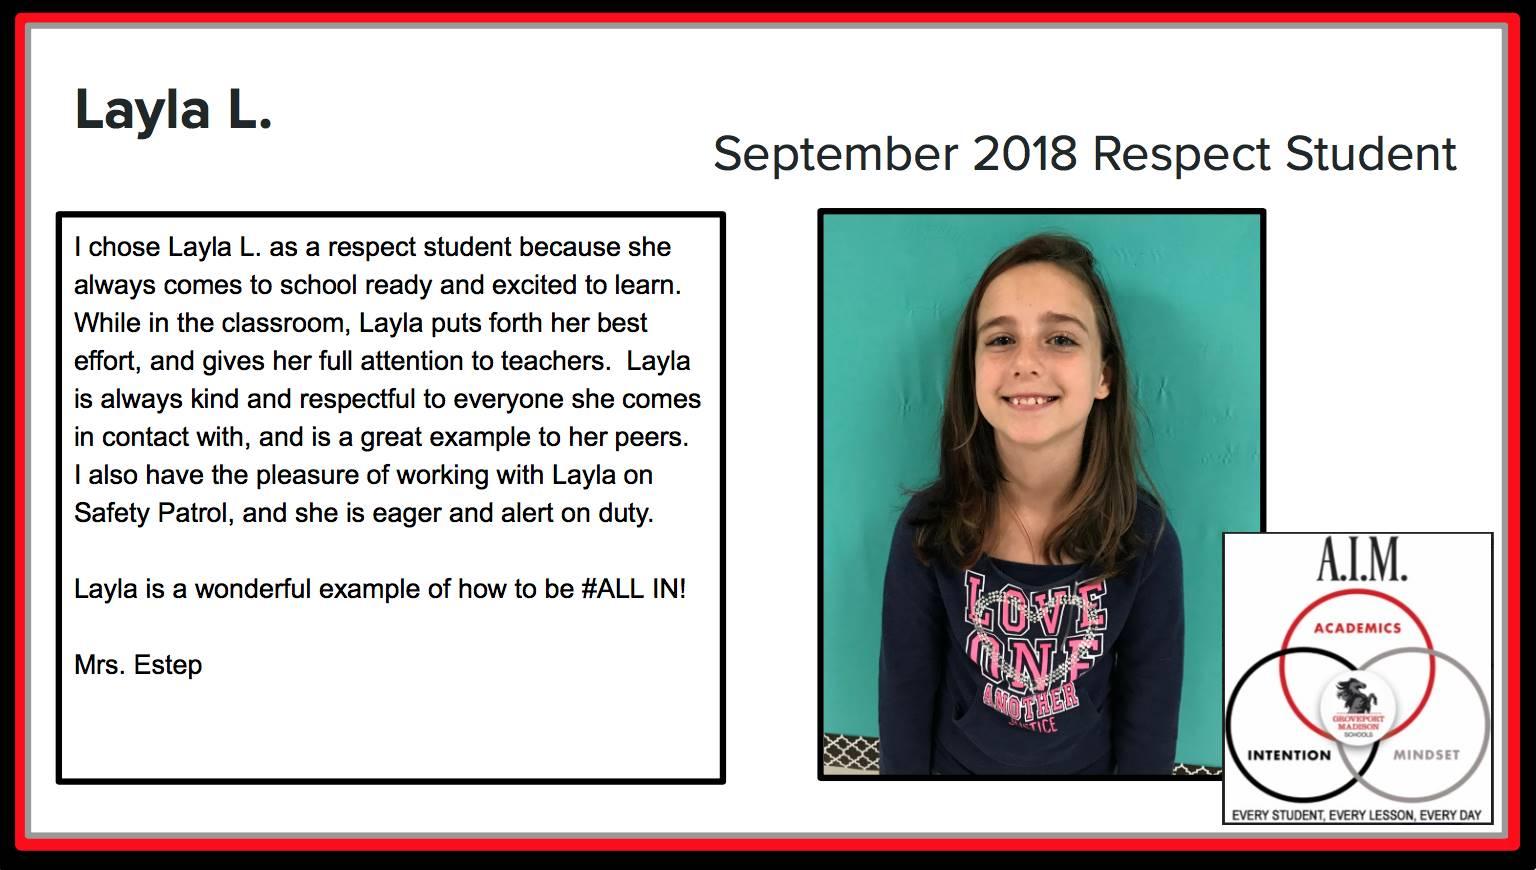 September Respect Student Layla